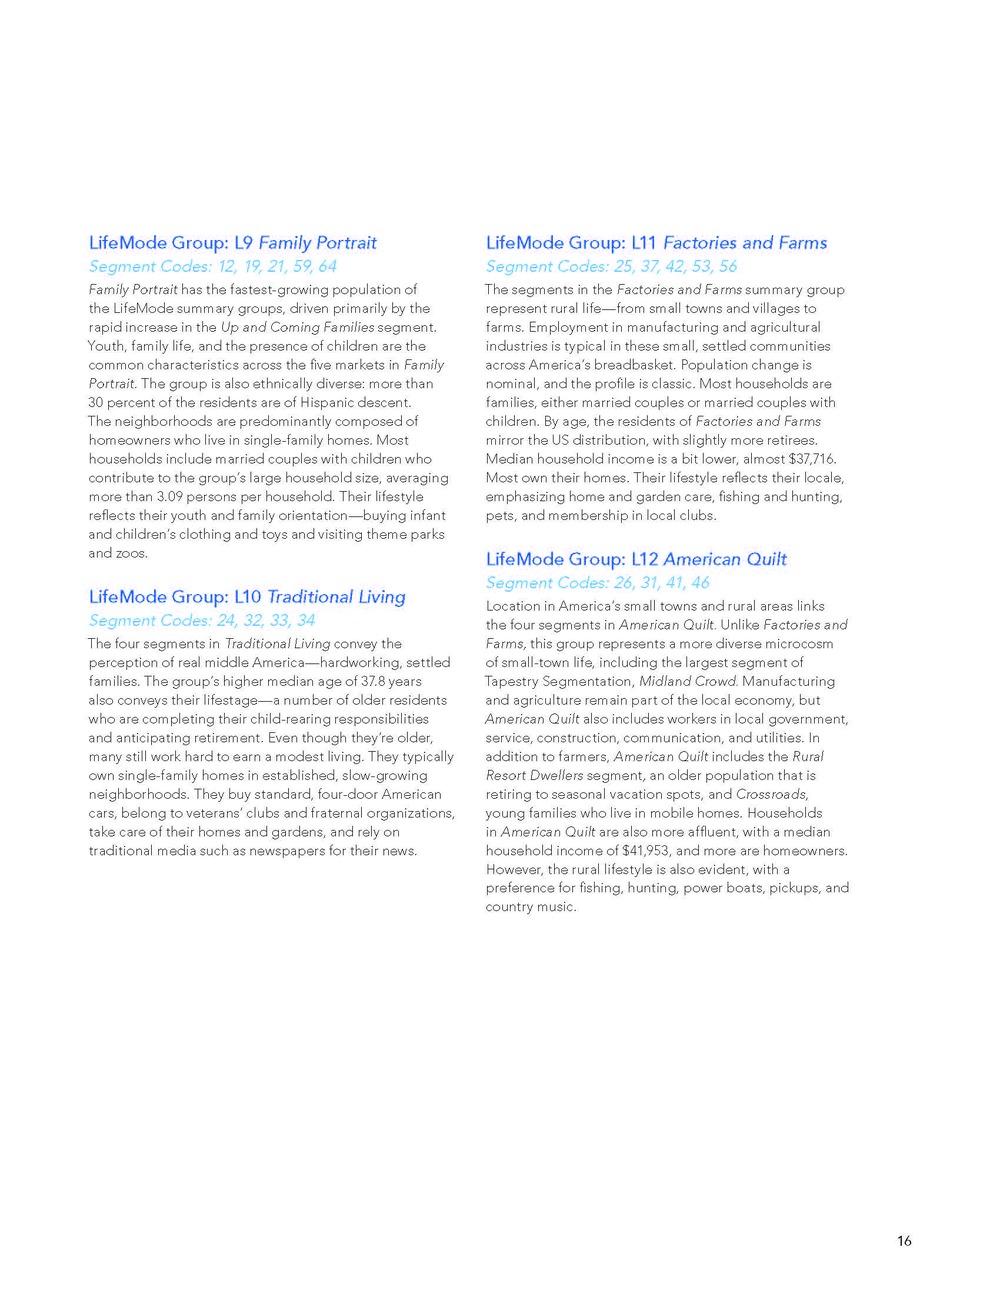 tapestry-segmentation_Page_19.jpg